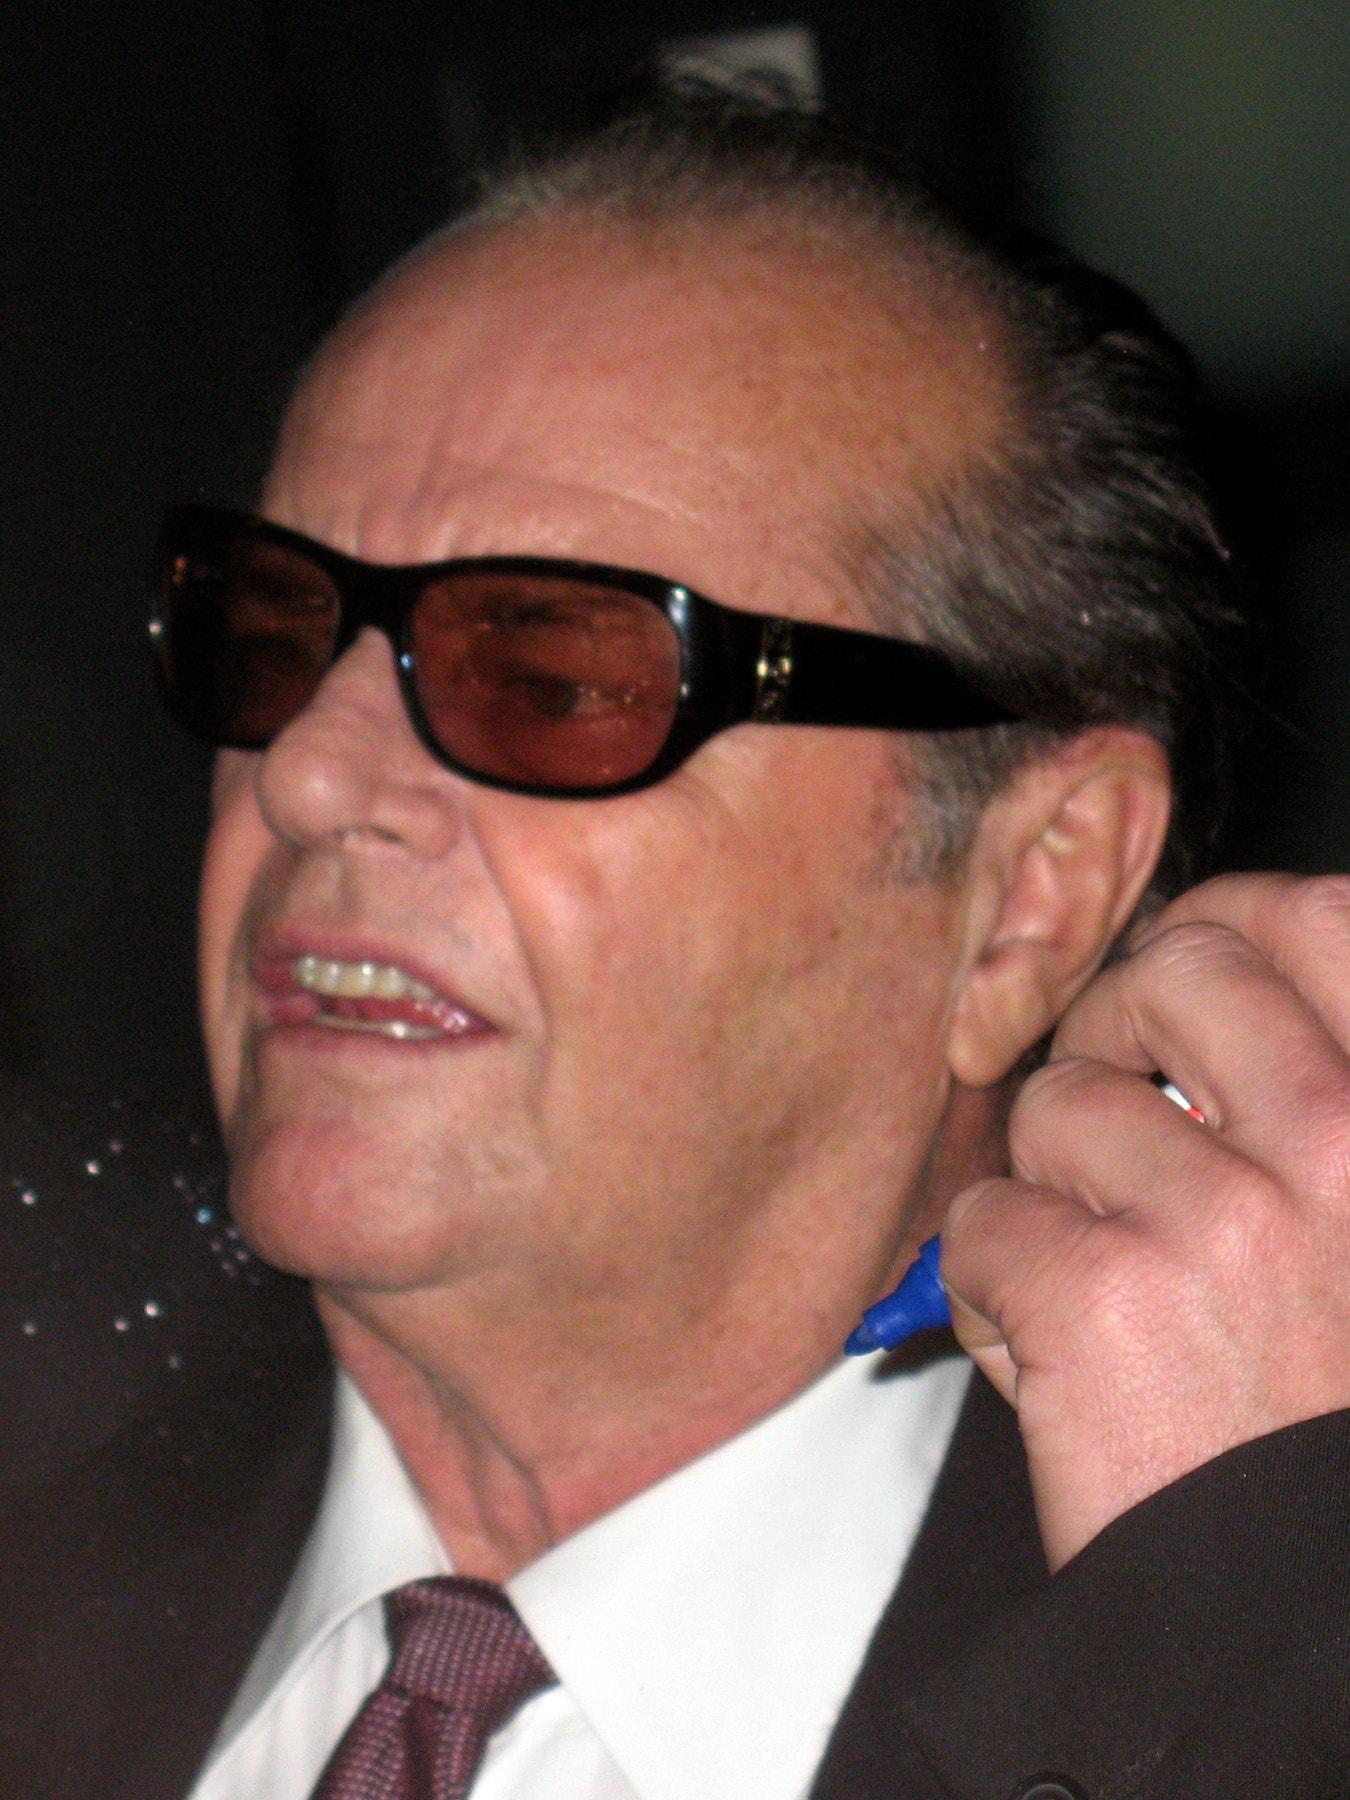 Jack Nicholson For mobile